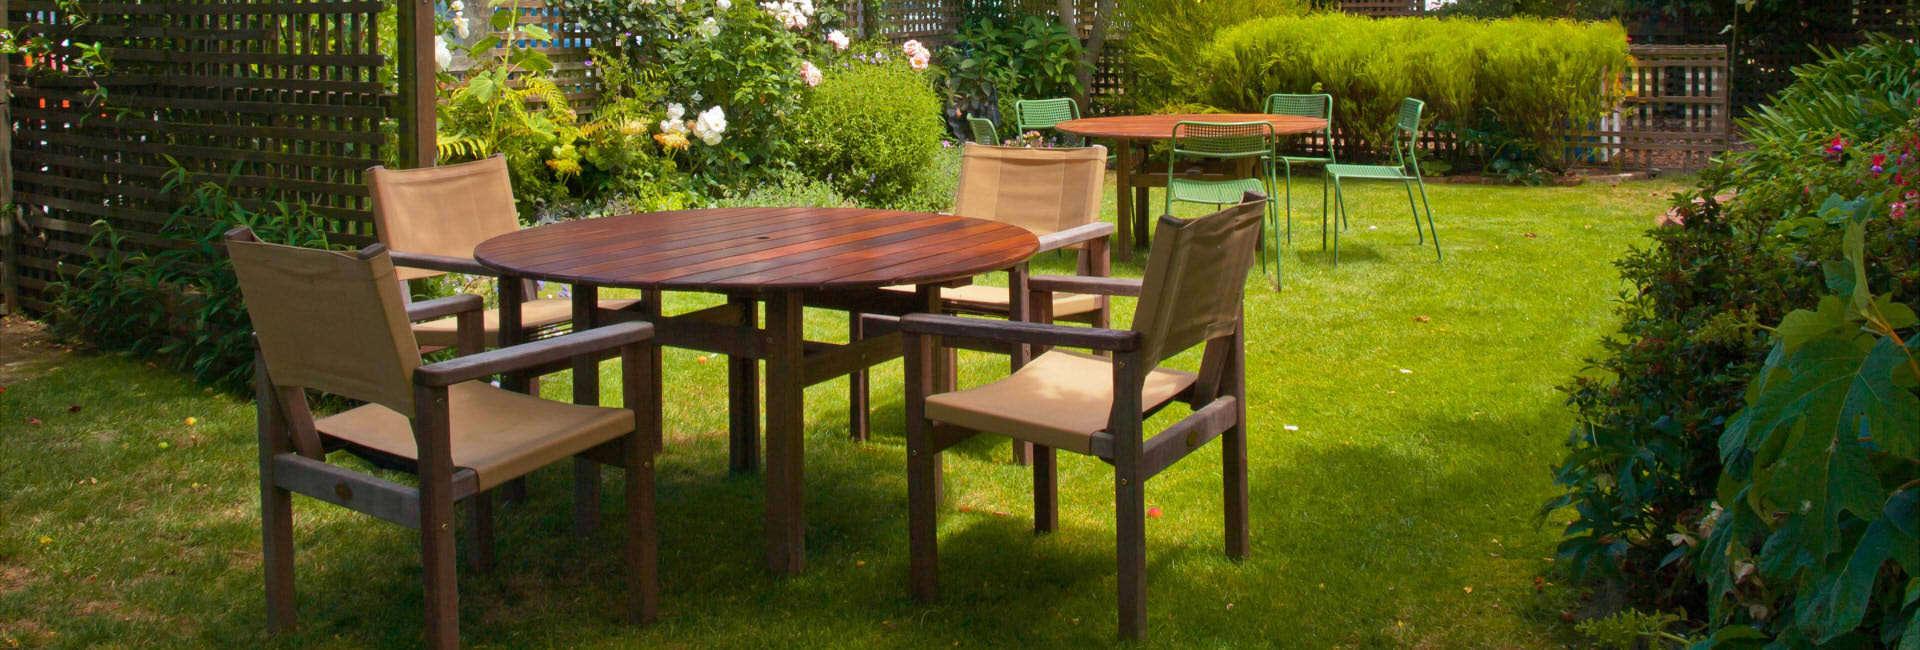 Meble Ogrodowe Drewno Eukaliptusowe : mebleogrodowe4